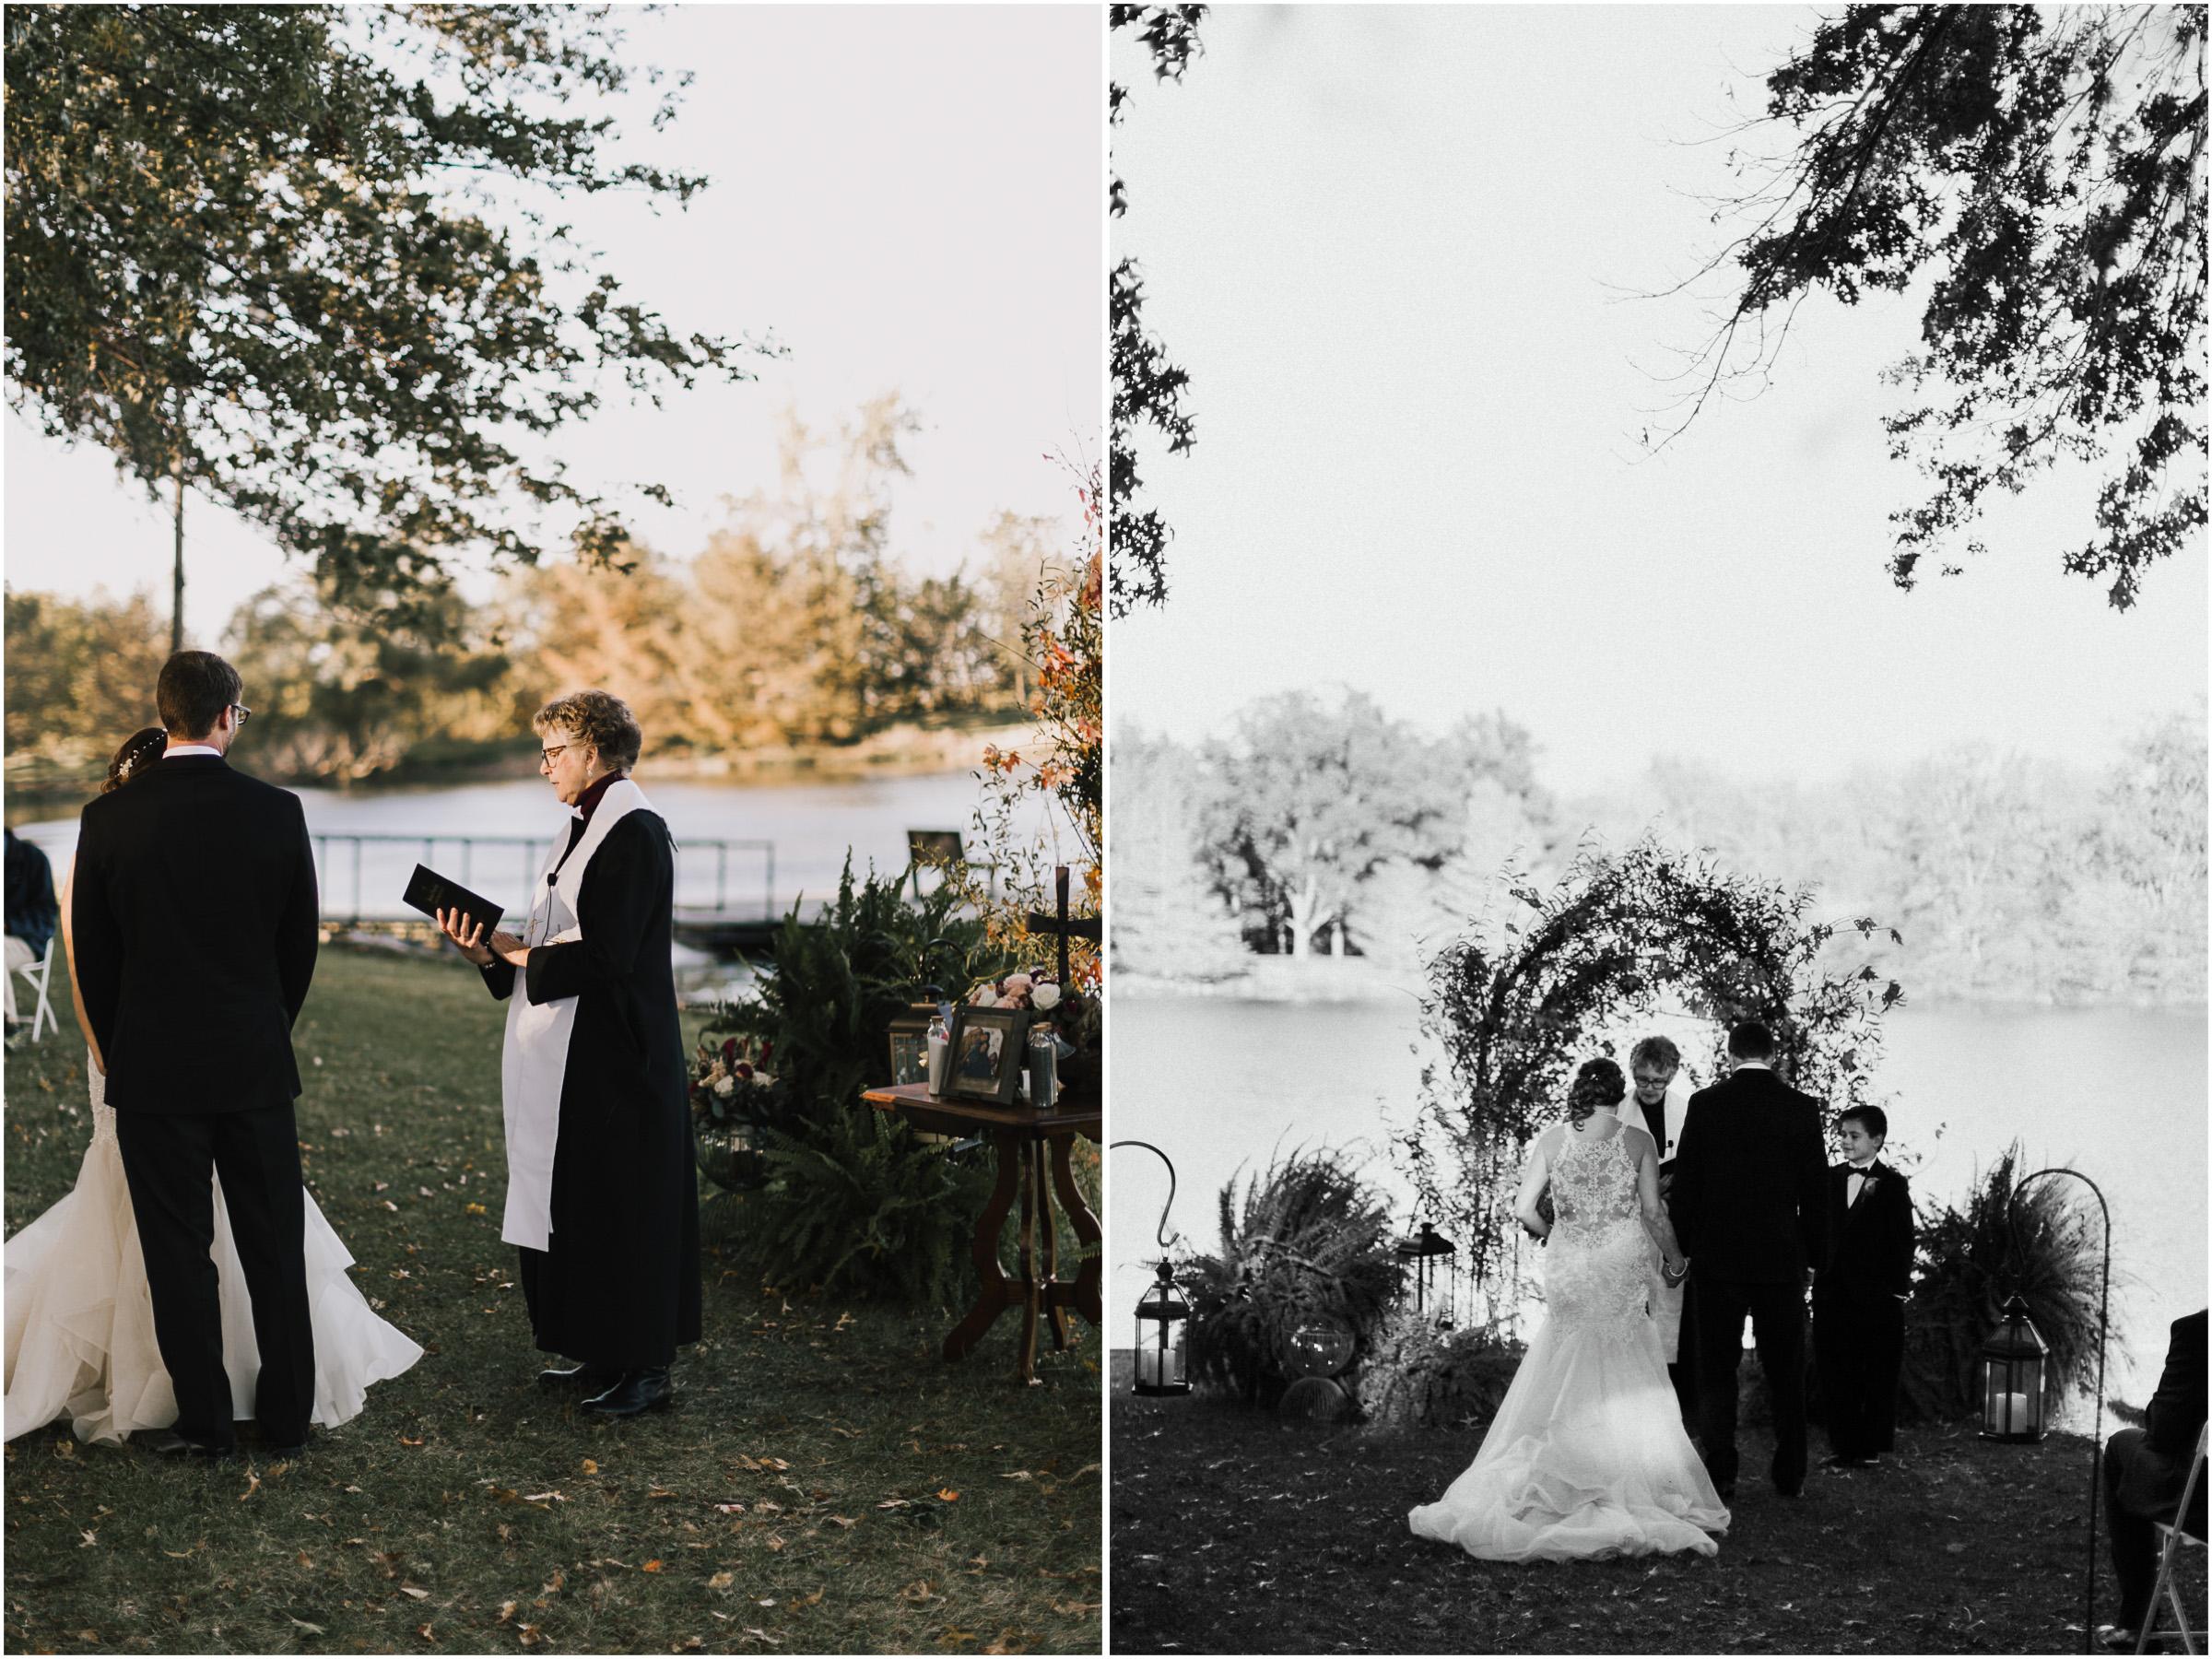 alyssa barletter photography intimate fall autumn wedding rural missouri wedding photographer-31.jpg